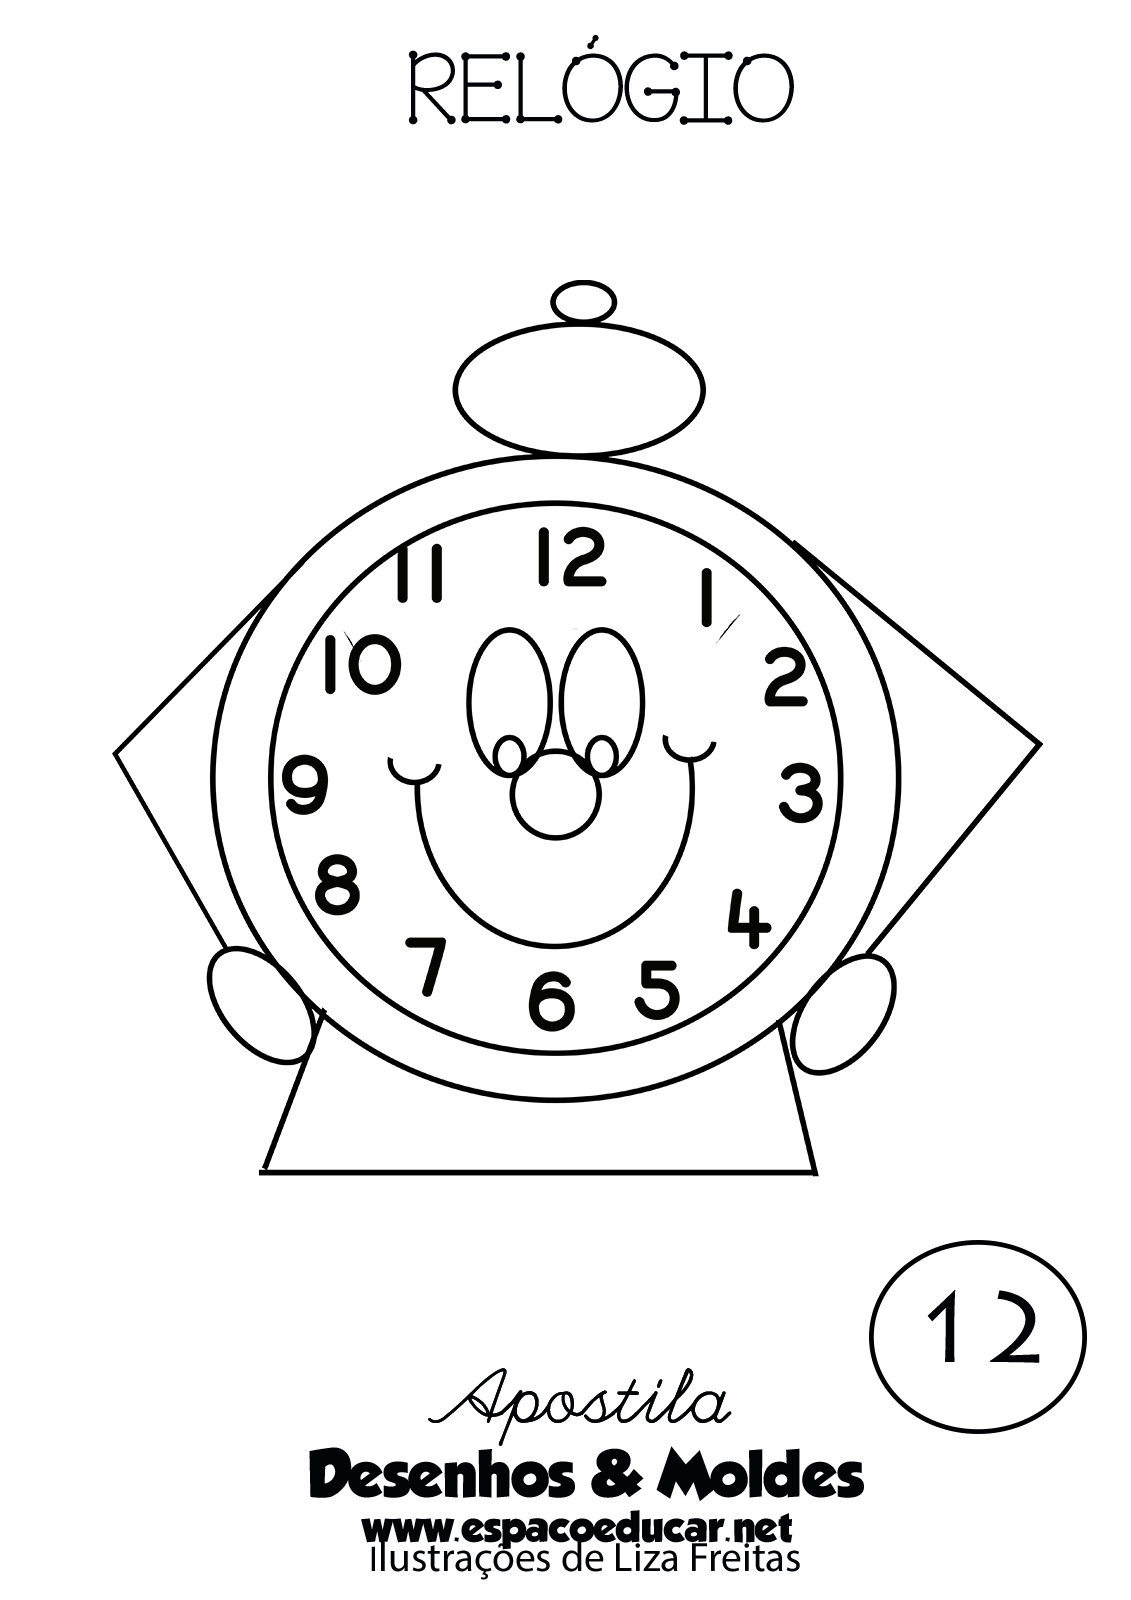 Desenho De Relogio Para Pintar Colorir Imprimir Espaco Educar